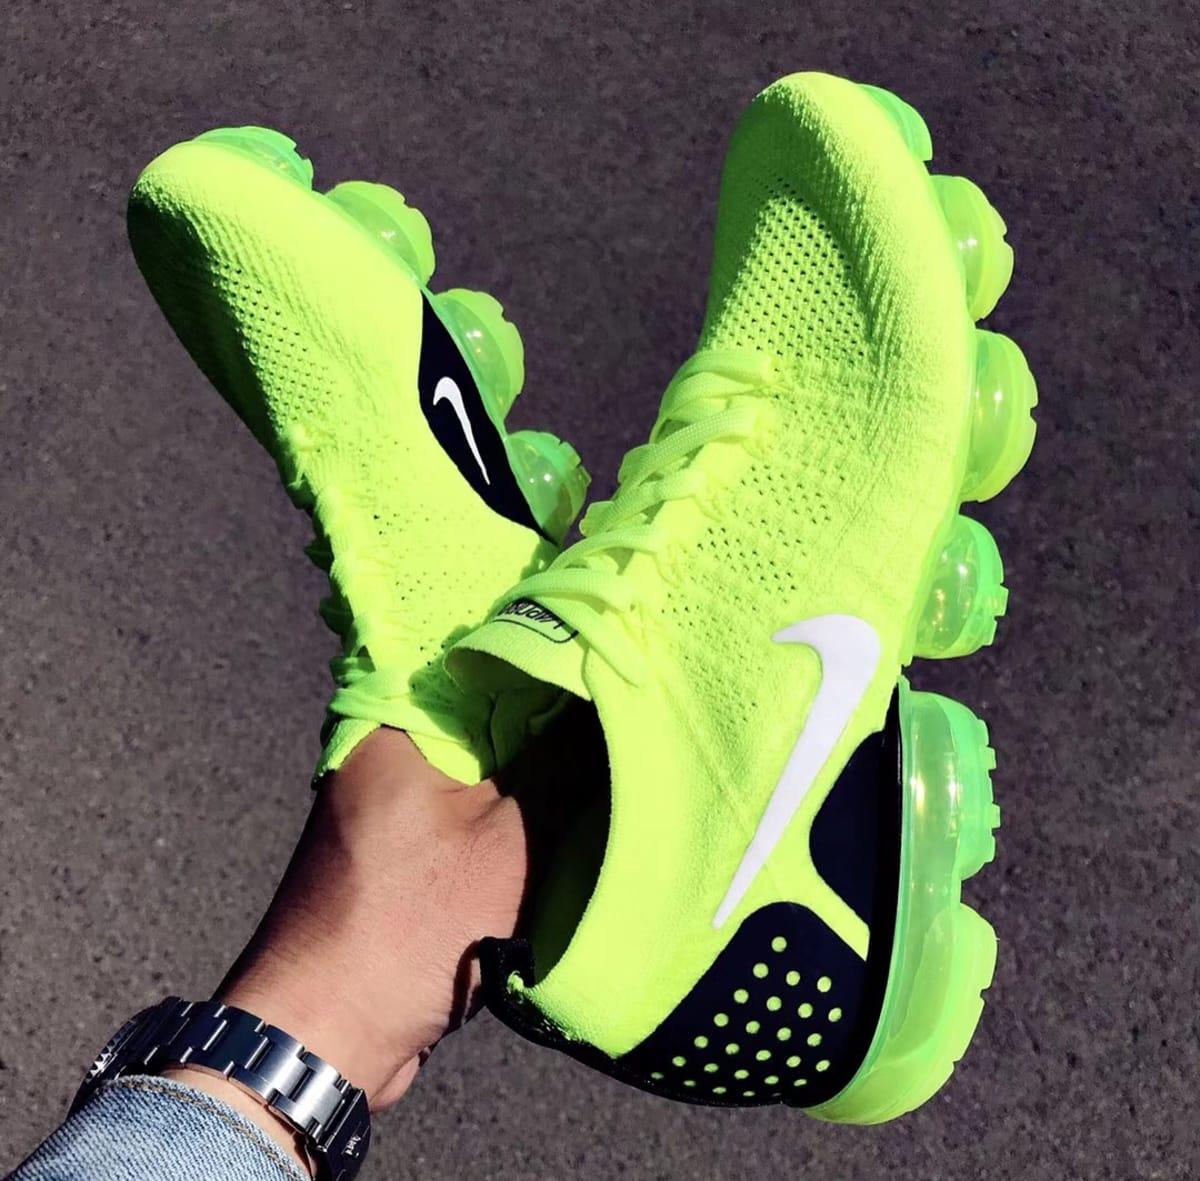 c6a6adf3cbe2 Nike Air VaporMax 2 Flyknit Volt Release Date 942842-700 (1) - Premier Kicks